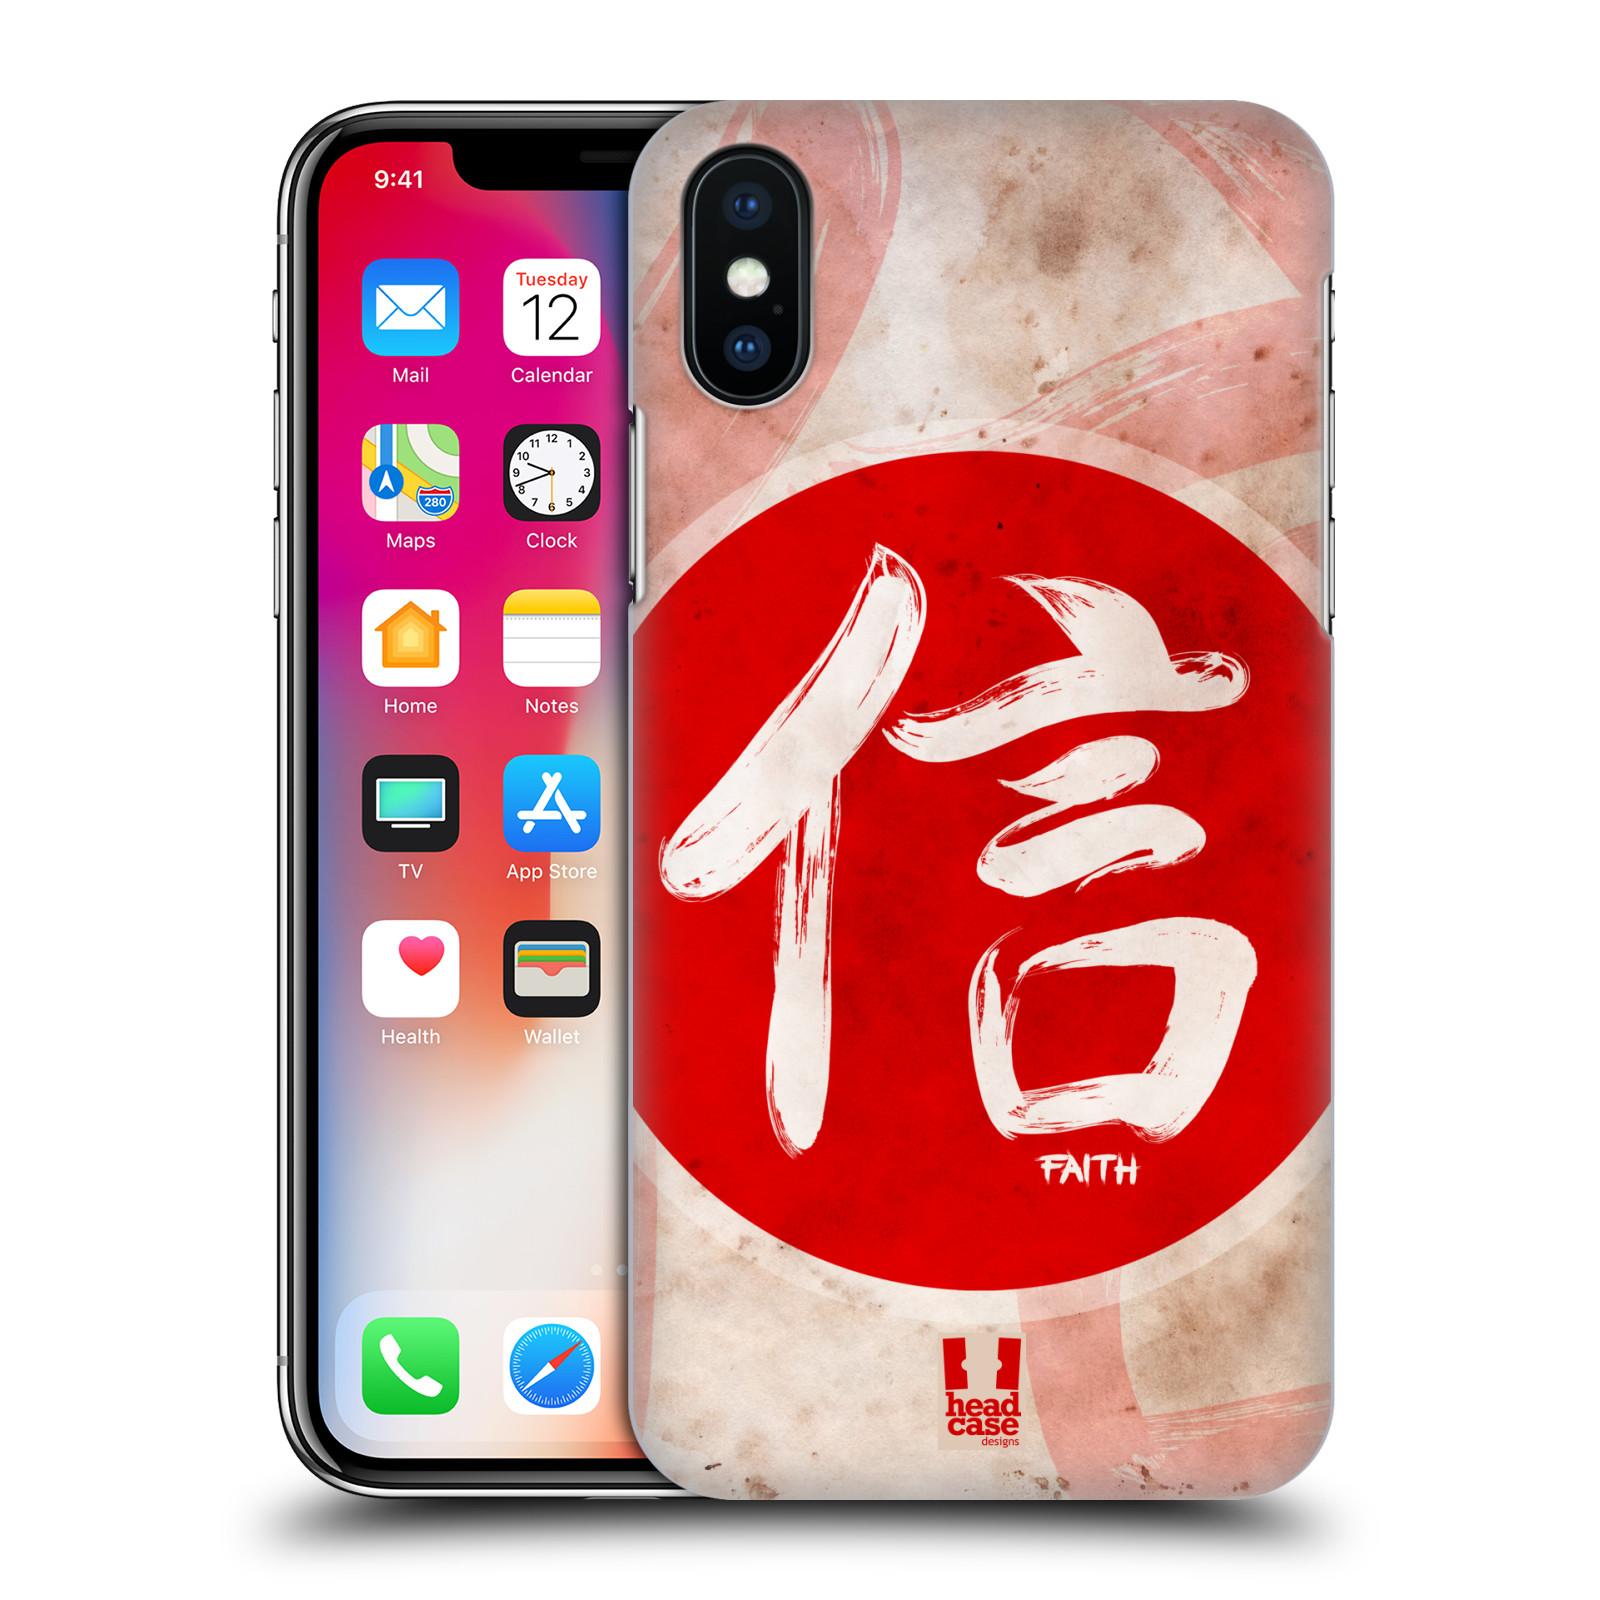 HEAD-CASE-DESIGNS-KANJI-ETUI-COQUE-D-039-ARRIERE-RIGIDE-POUR-APPLE-iPHONE-X